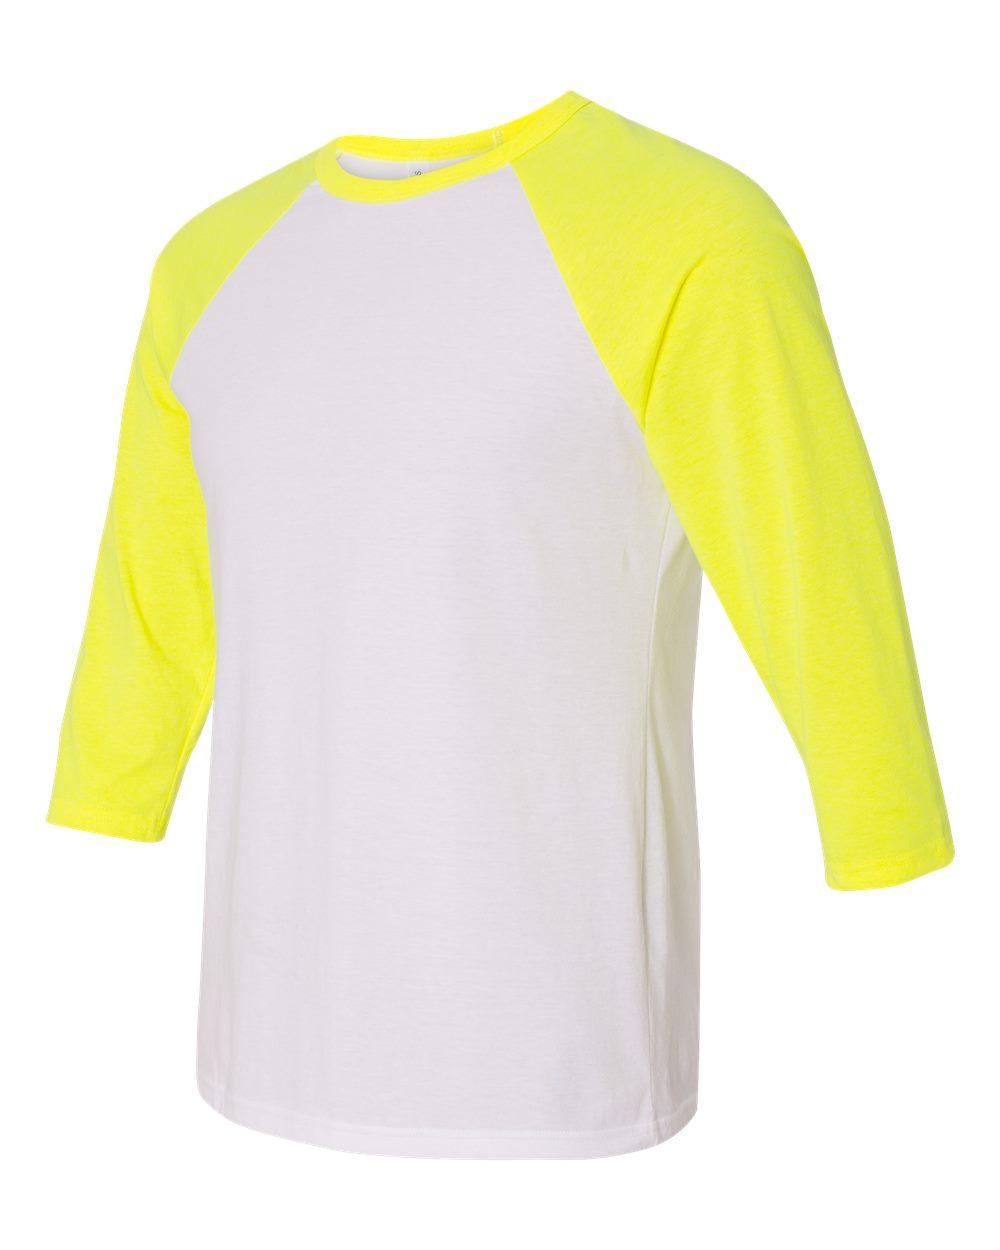 click to view White/Neon Yellow